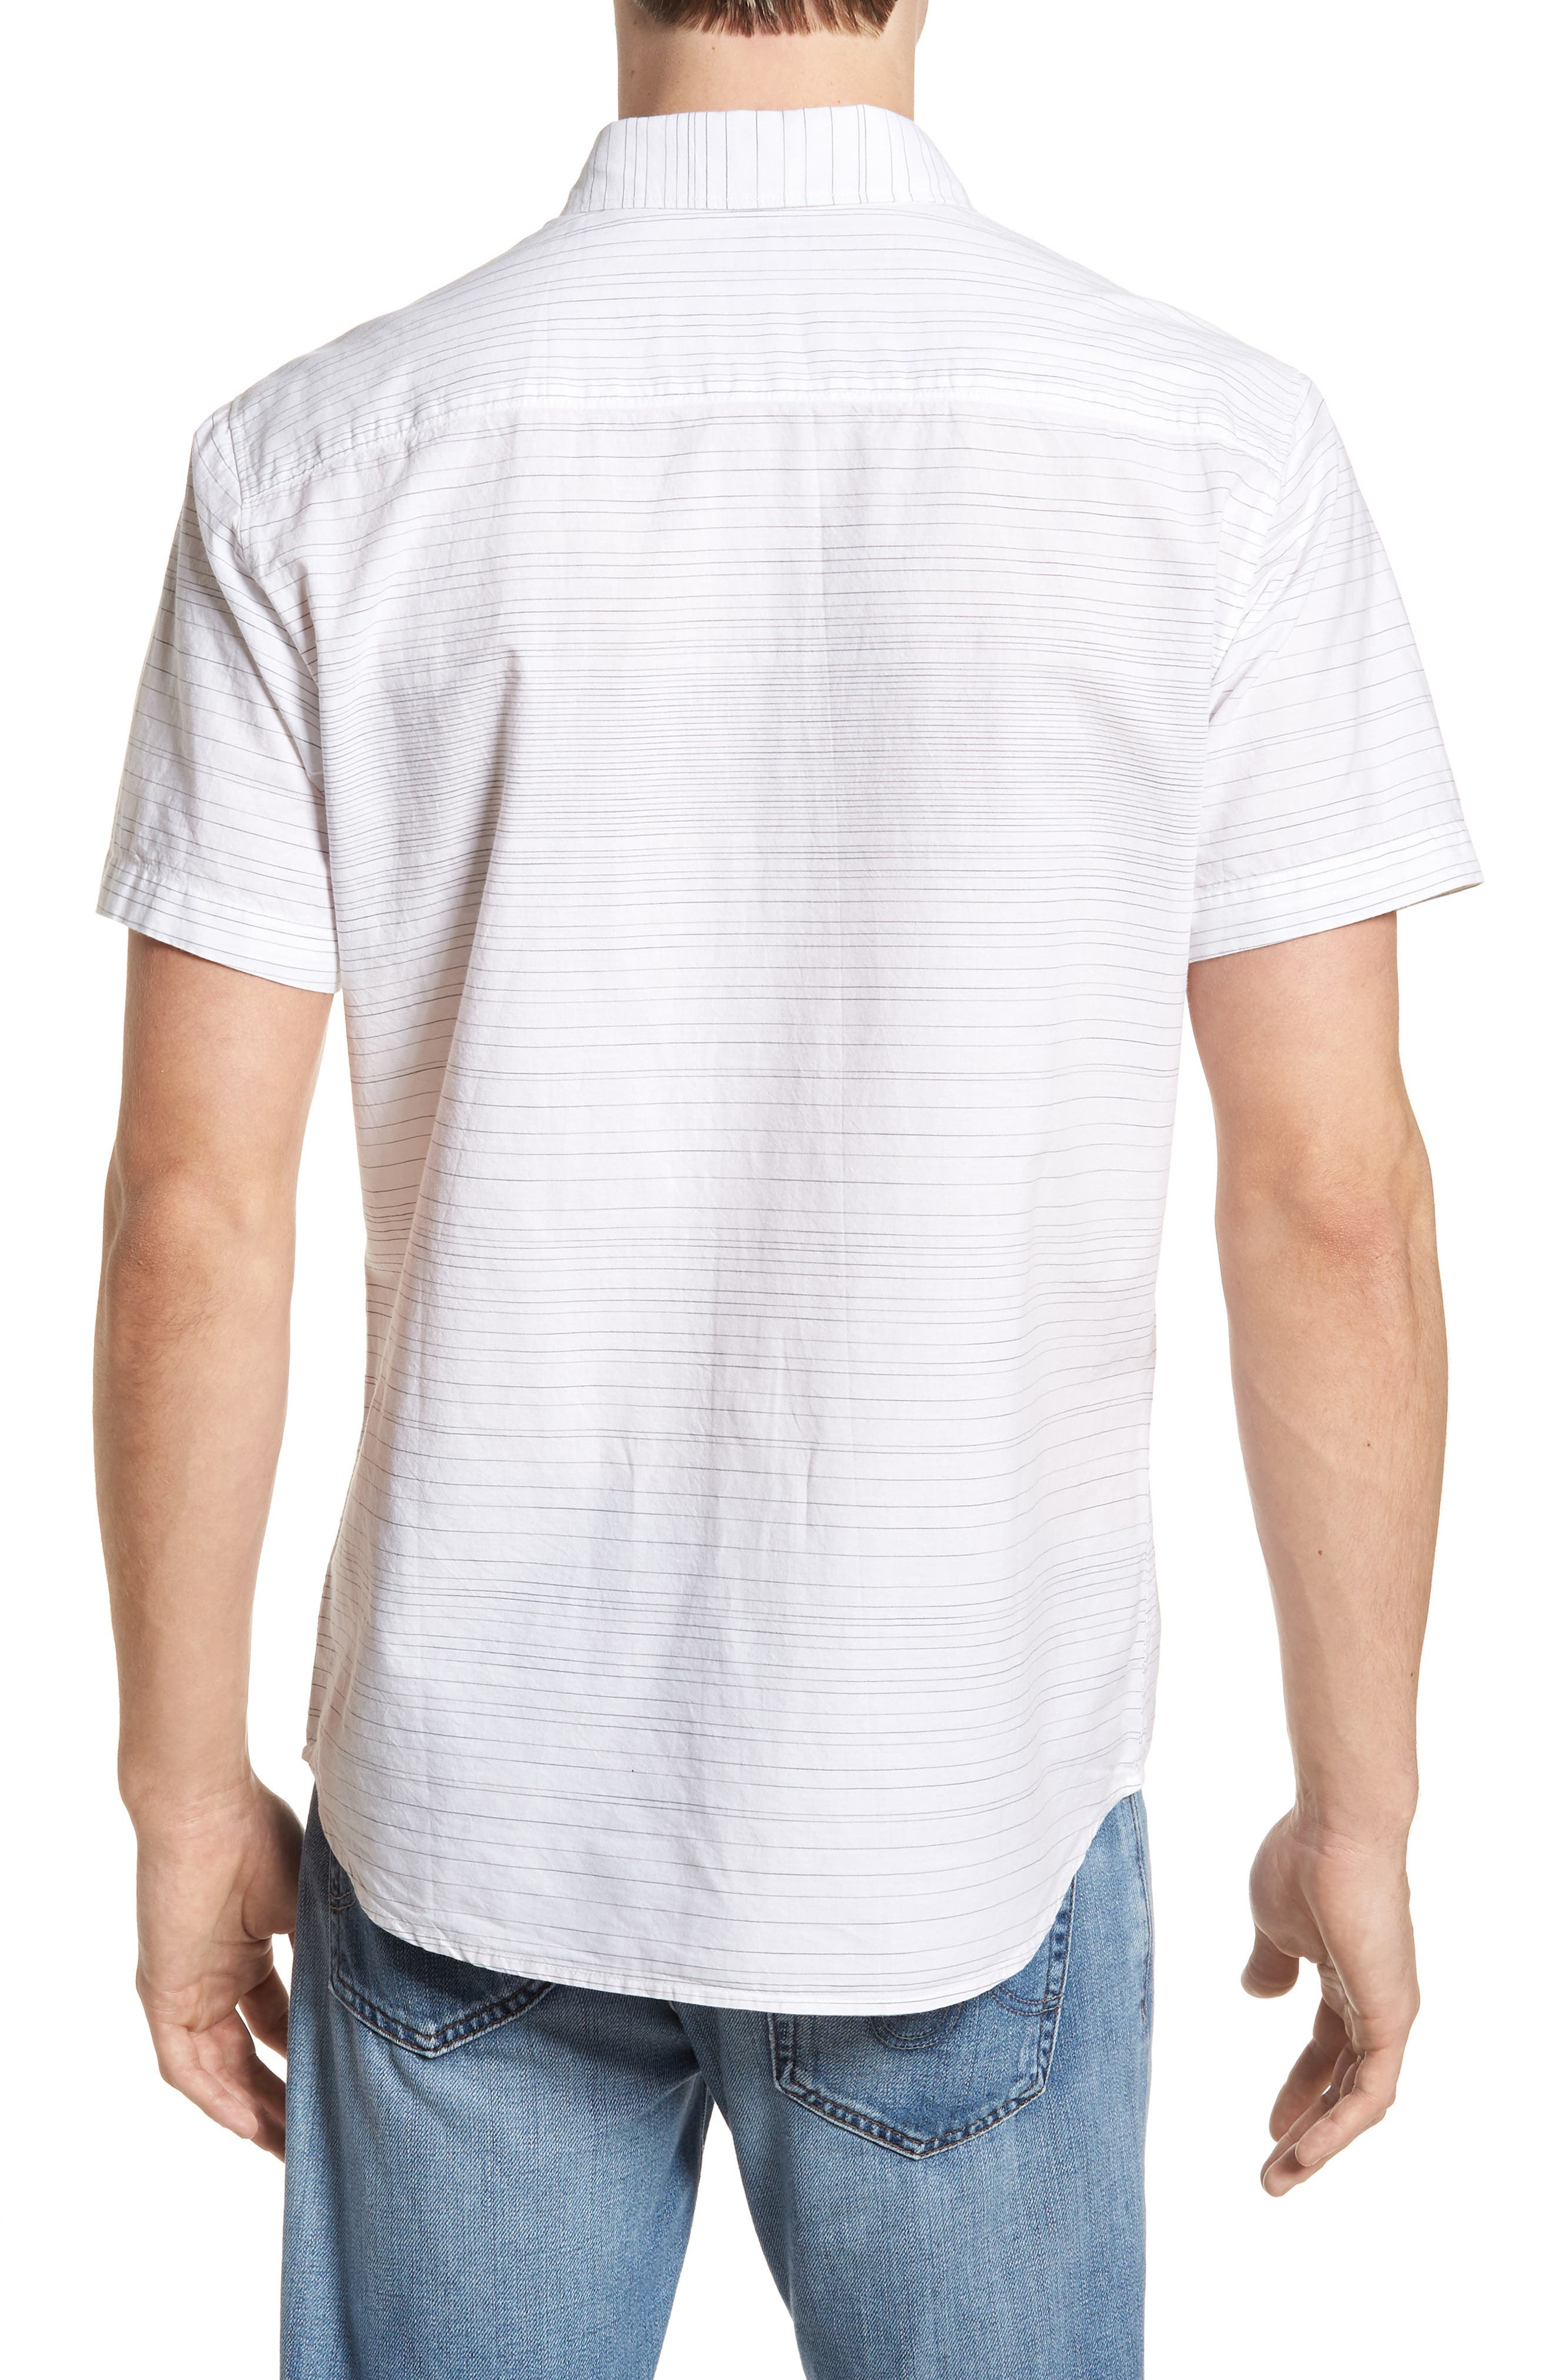 Hound Woven Shirt,                             Alternate thumbnail 4, color,